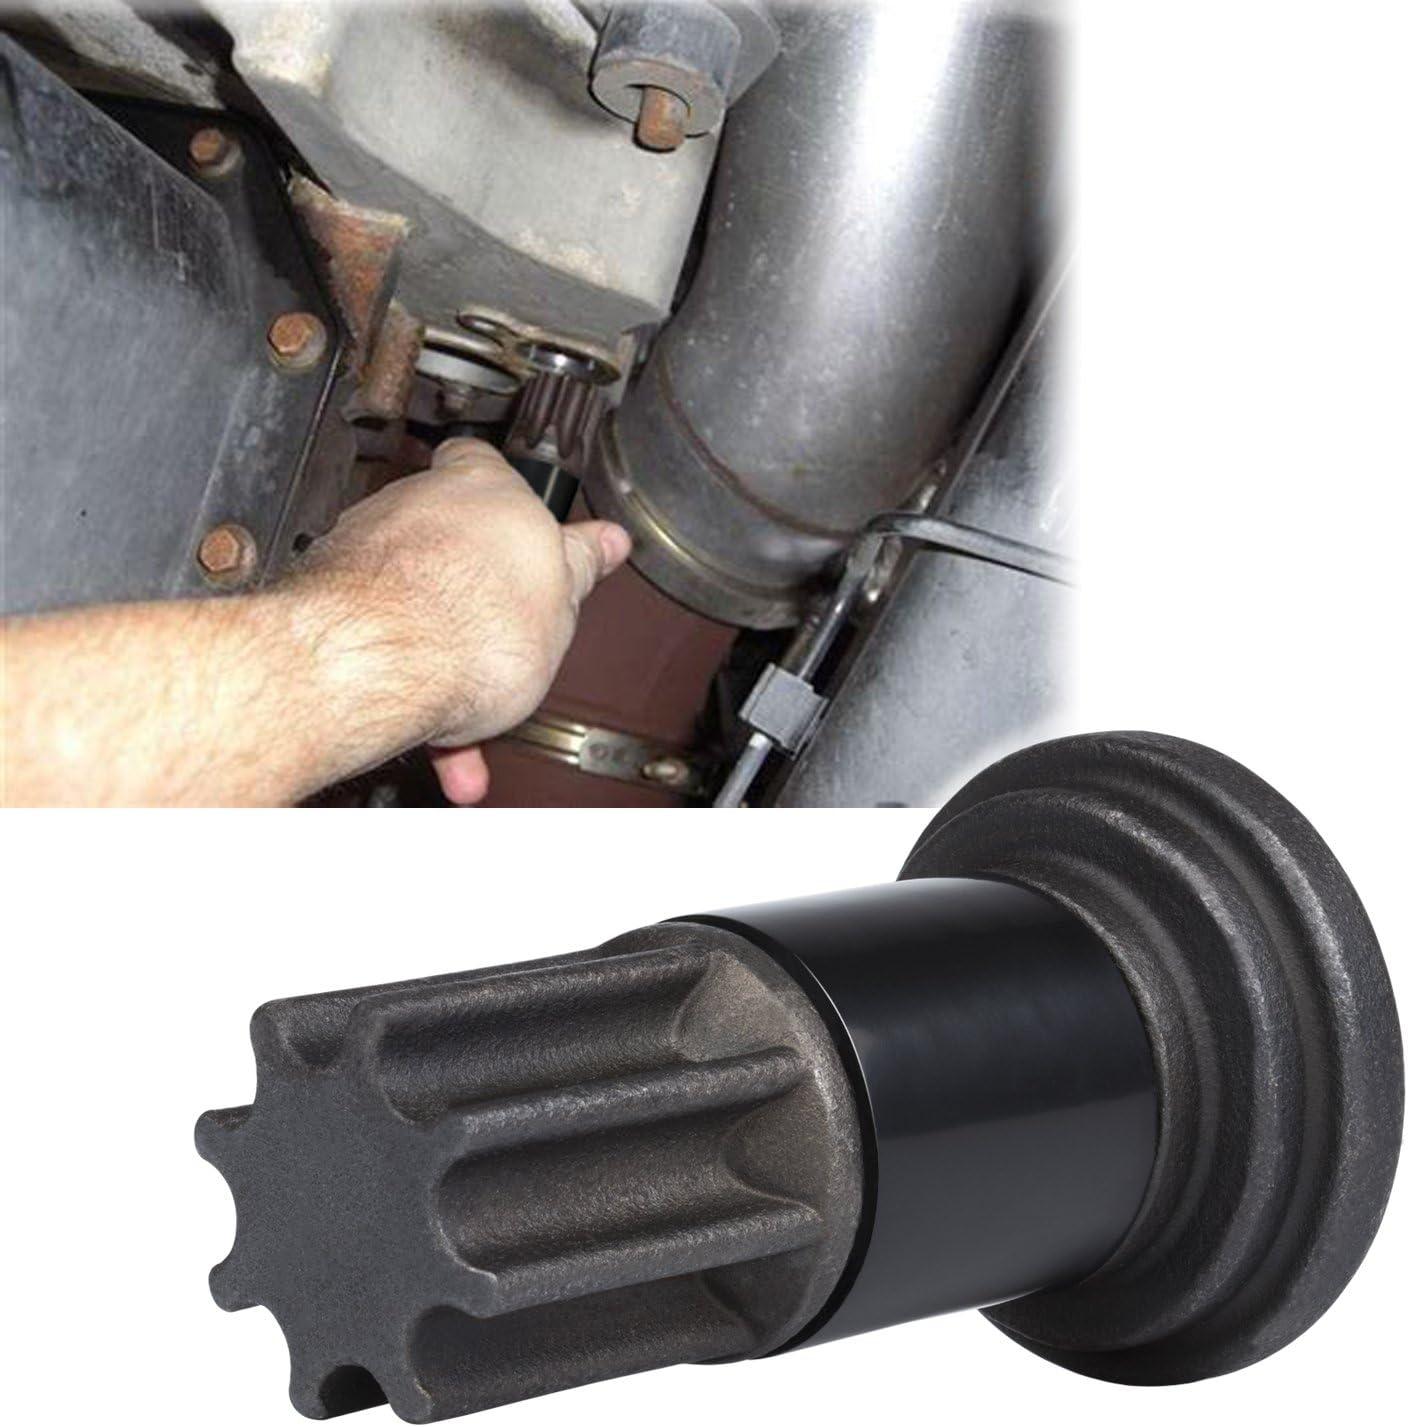 for Cummins Engine Barring/Rotating Tool for Cummins B/C Series and Dodge Pickups 3.9L, 5.9L, 6.7L & 8.3L Diesels Engines